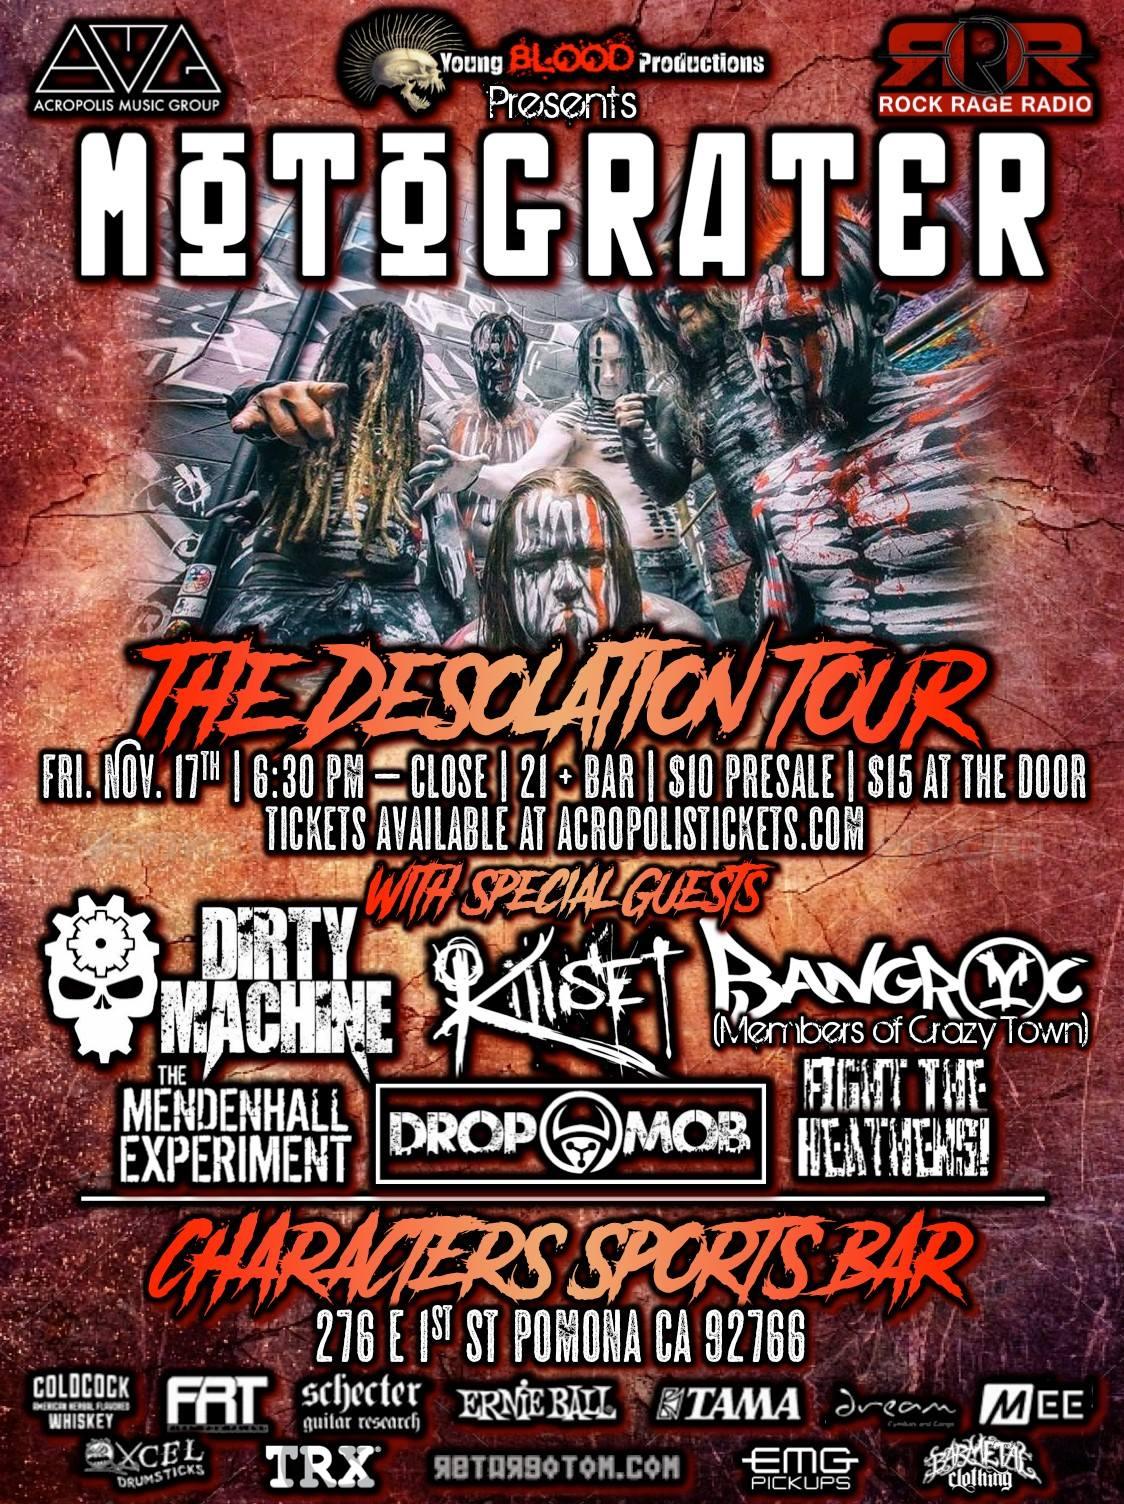 MOTOGRATER - The Desolation Tour